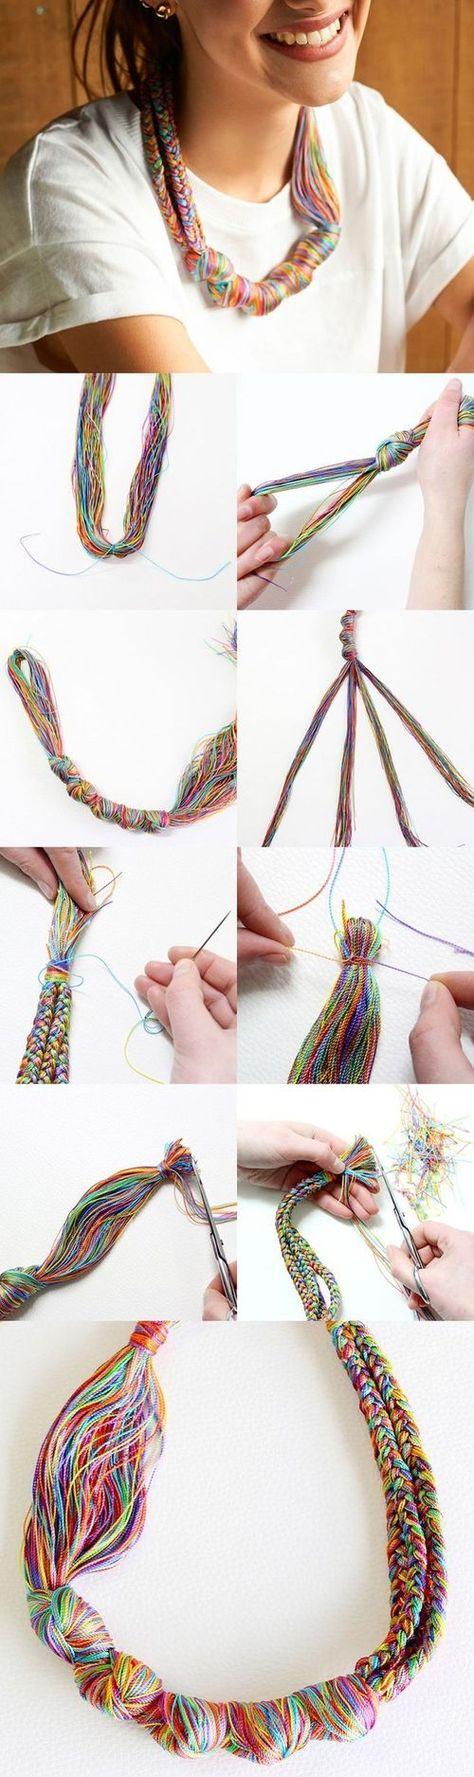 DIY: Embroidery Thread Necklace